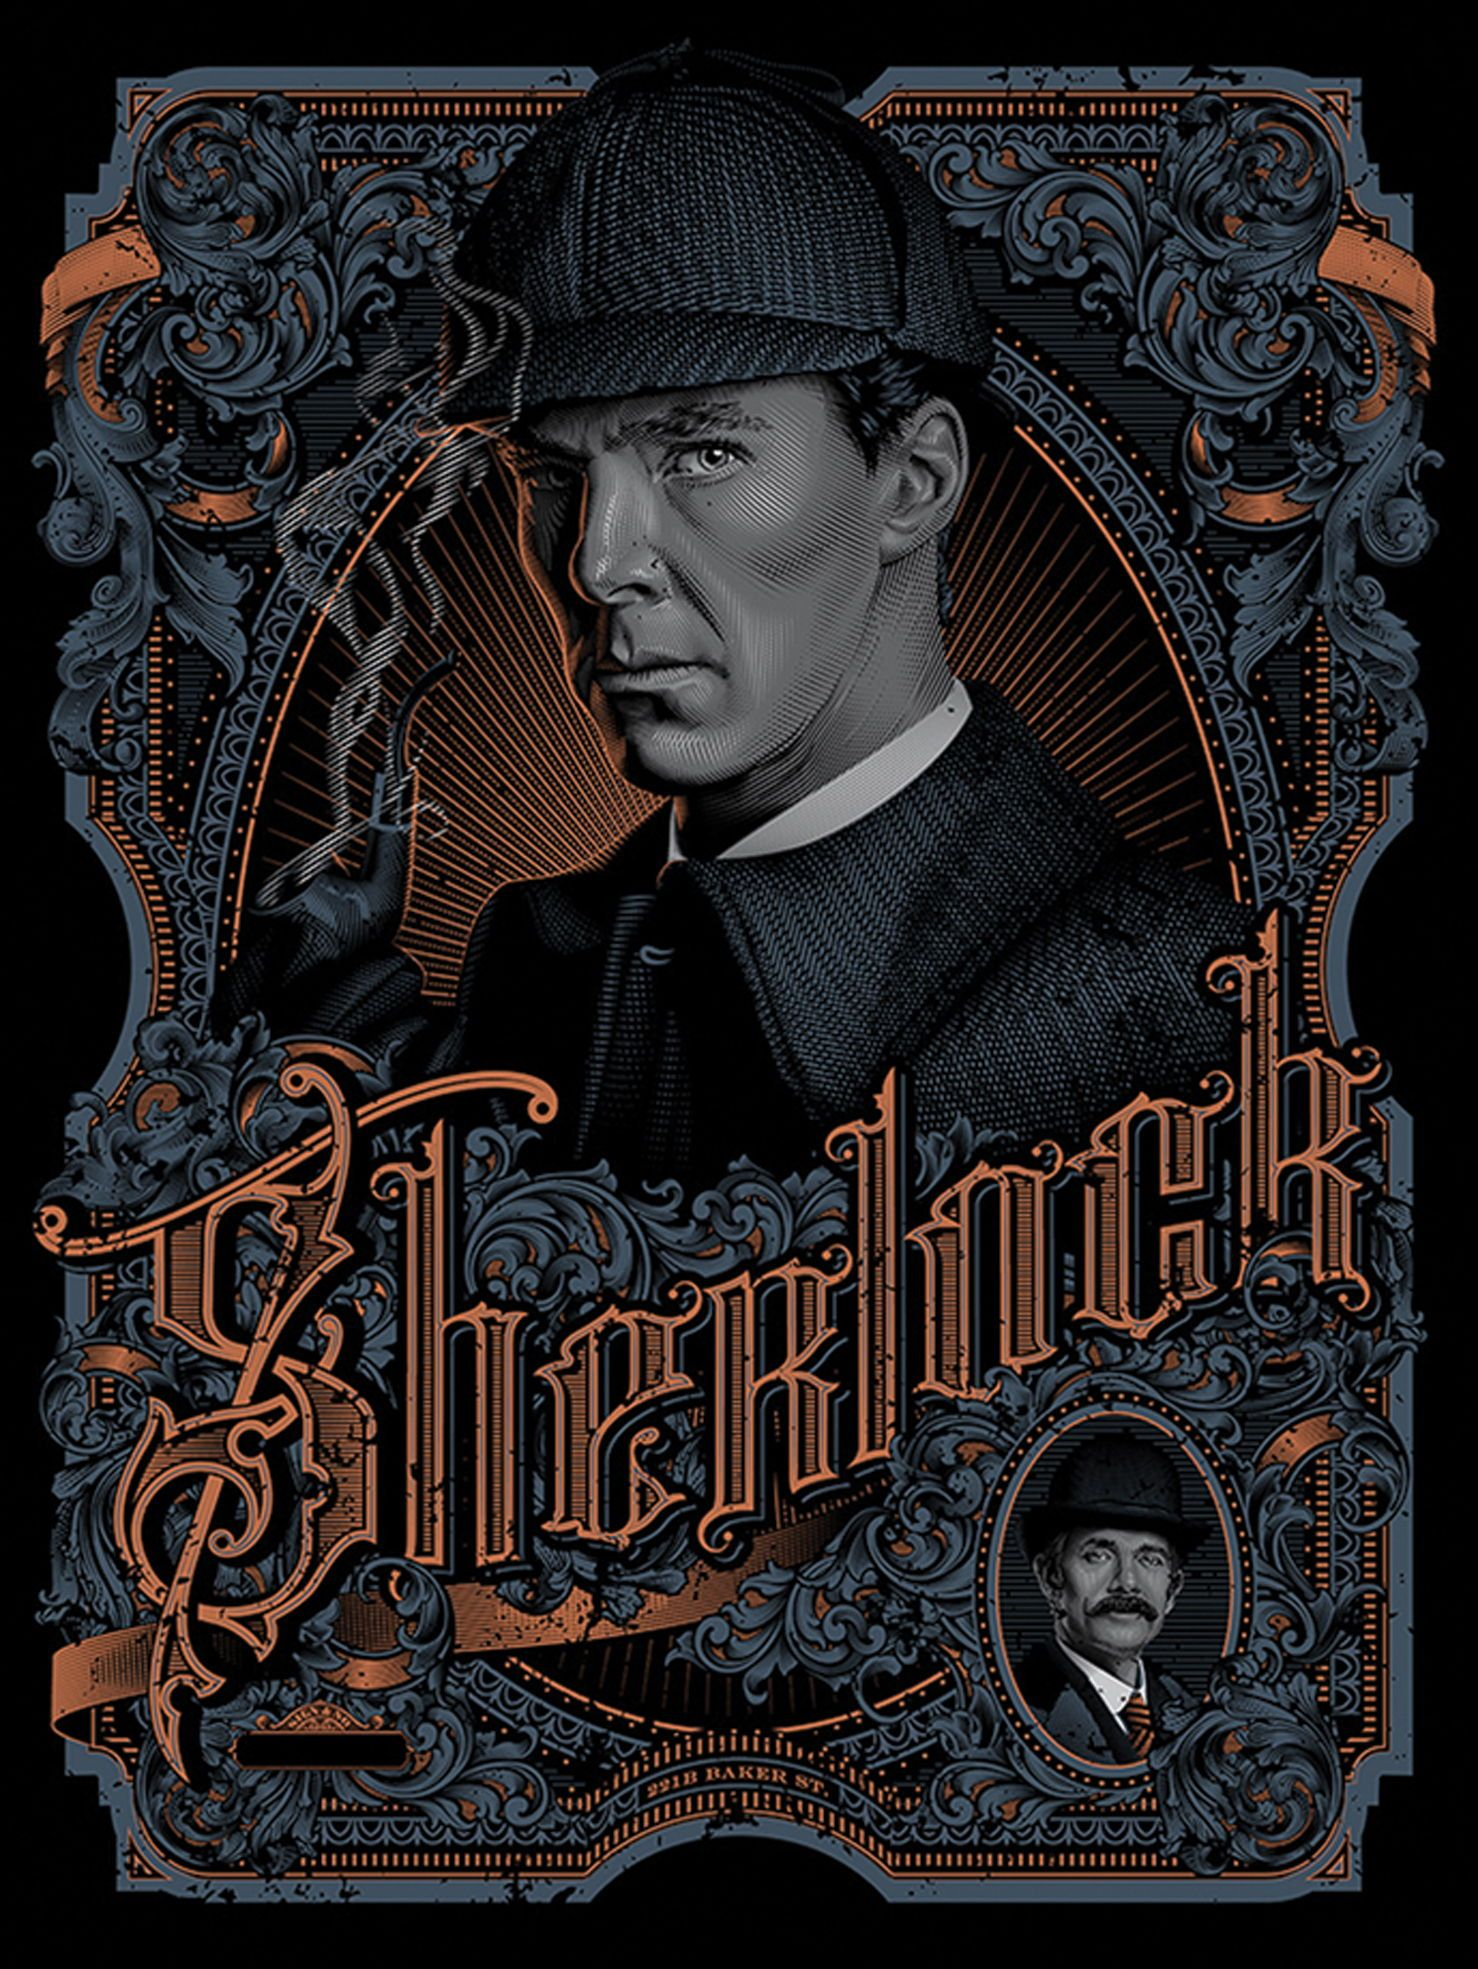 Sherlock Christmas Special 2019 TRACIE CHING | Benedict cumberbatch in 2019 | Sherlock, Sherlock